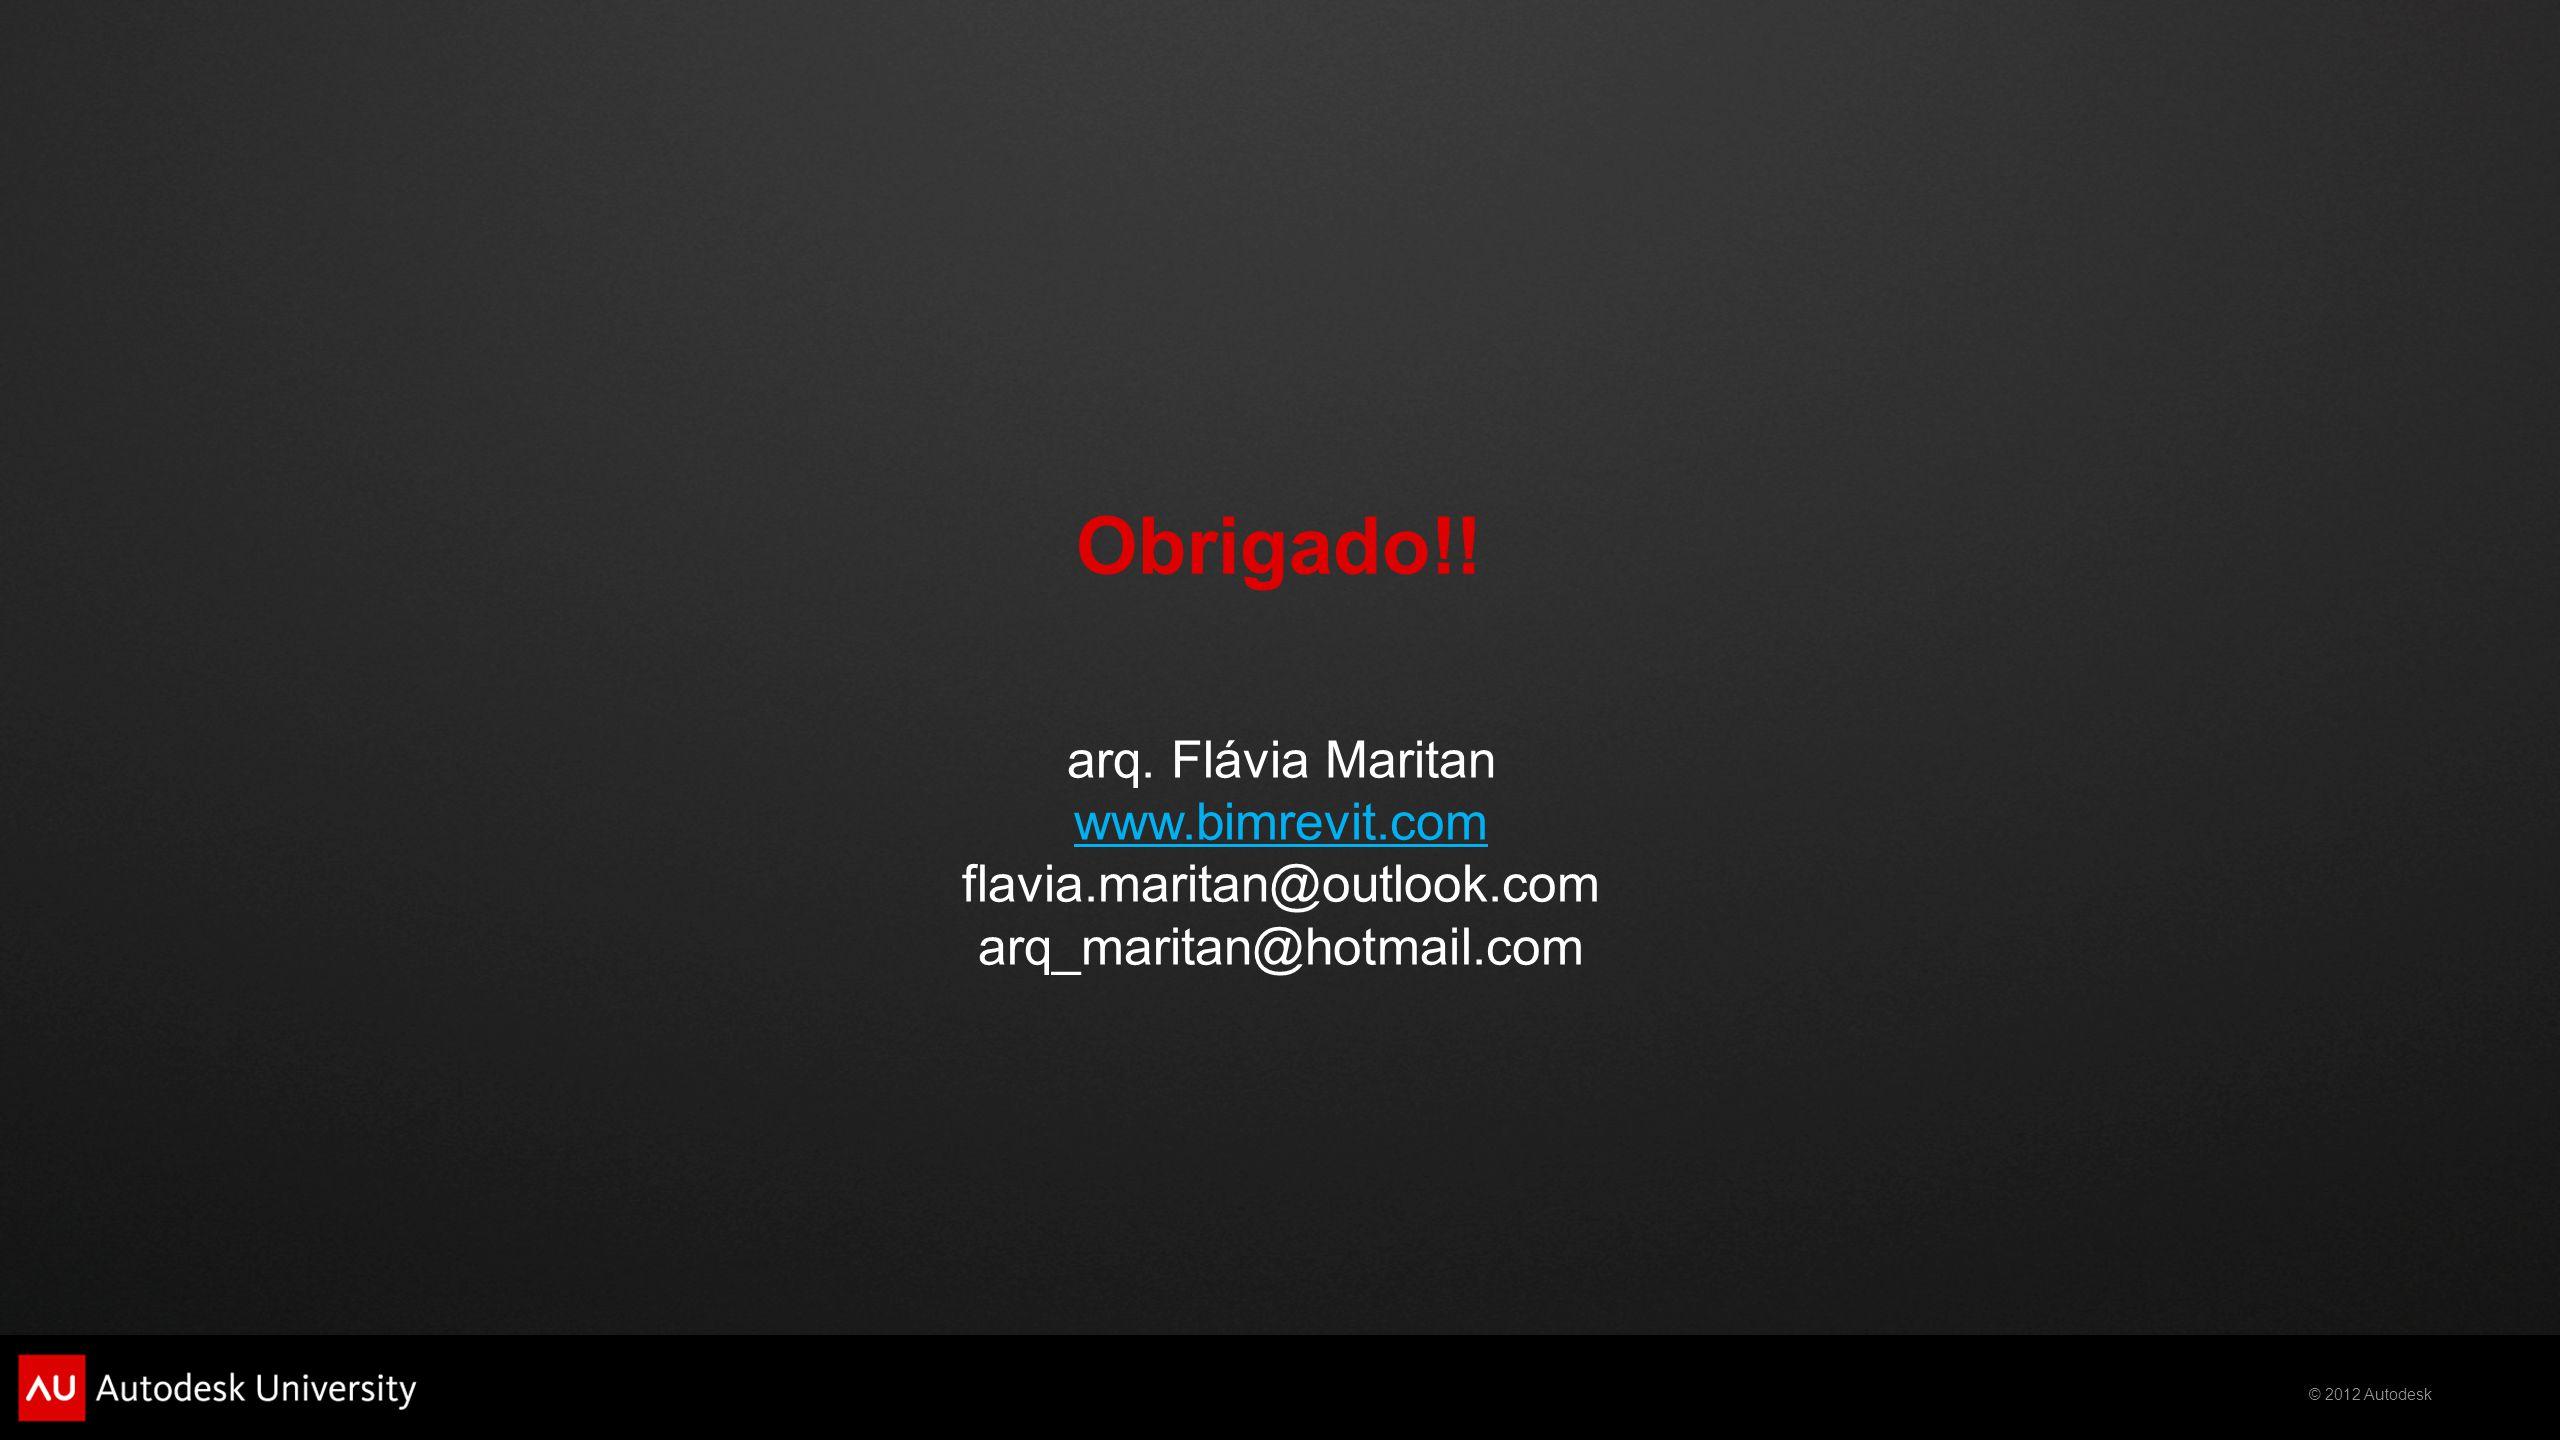 Obrigado!! arq. Flávia Maritan www.bimrevit.com